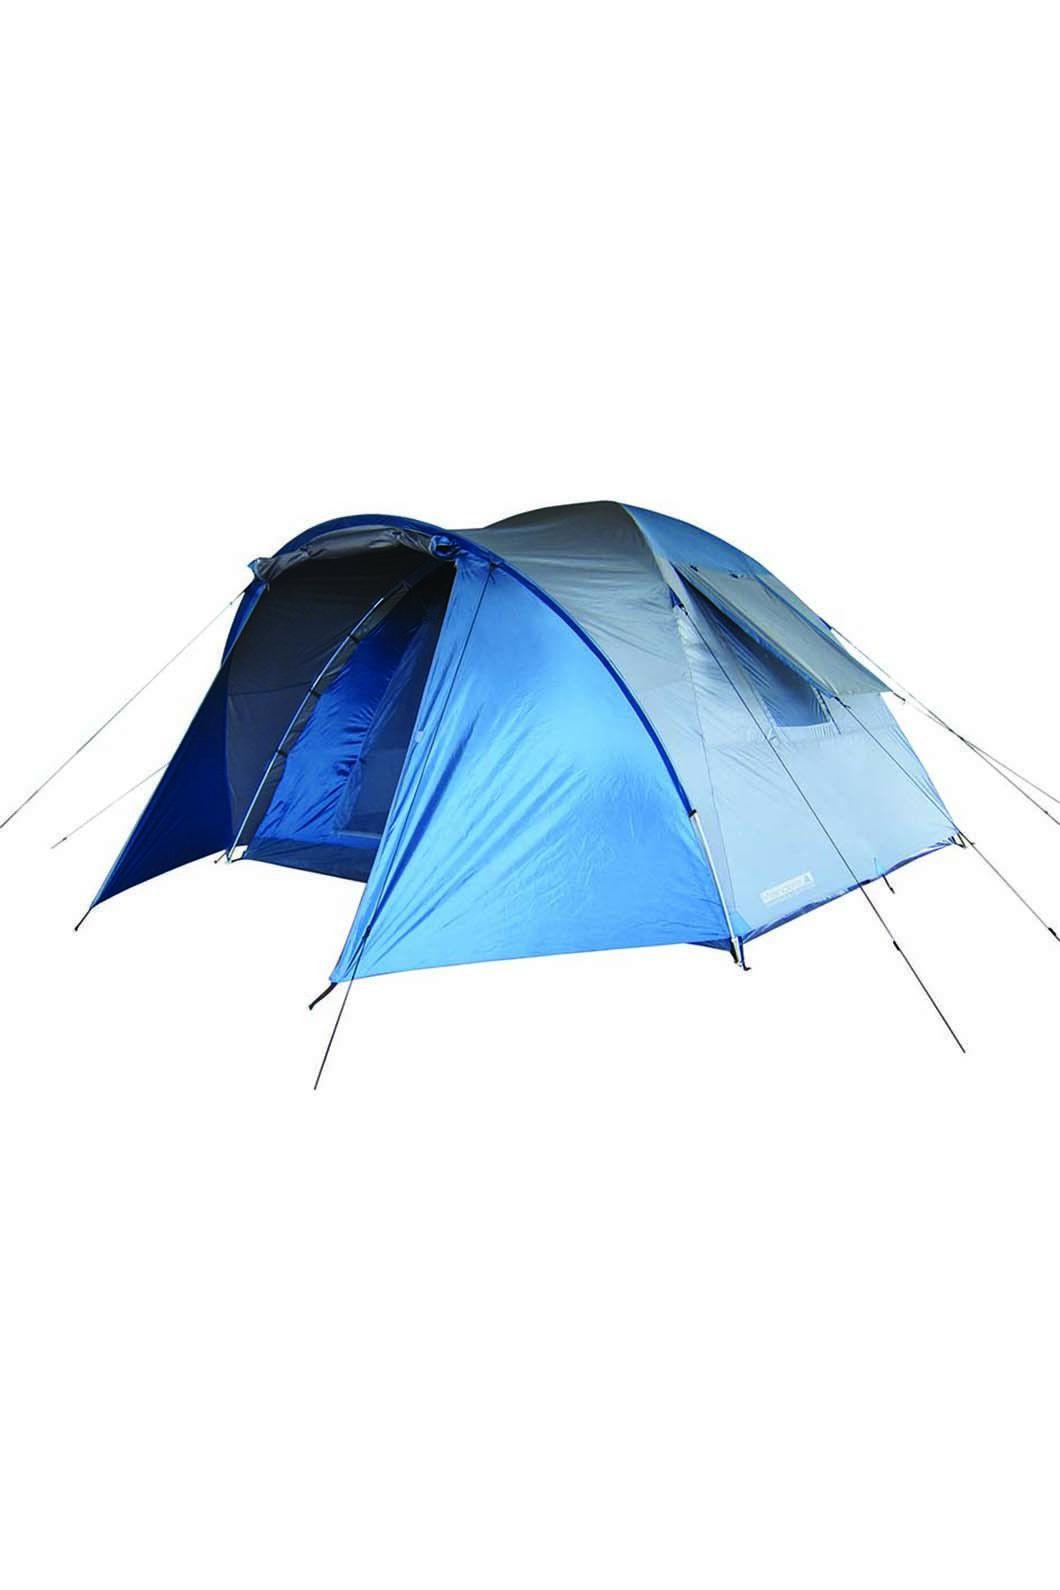 Wanderer Magnitude 6V 6 Person Dome Tent, None, hi-res